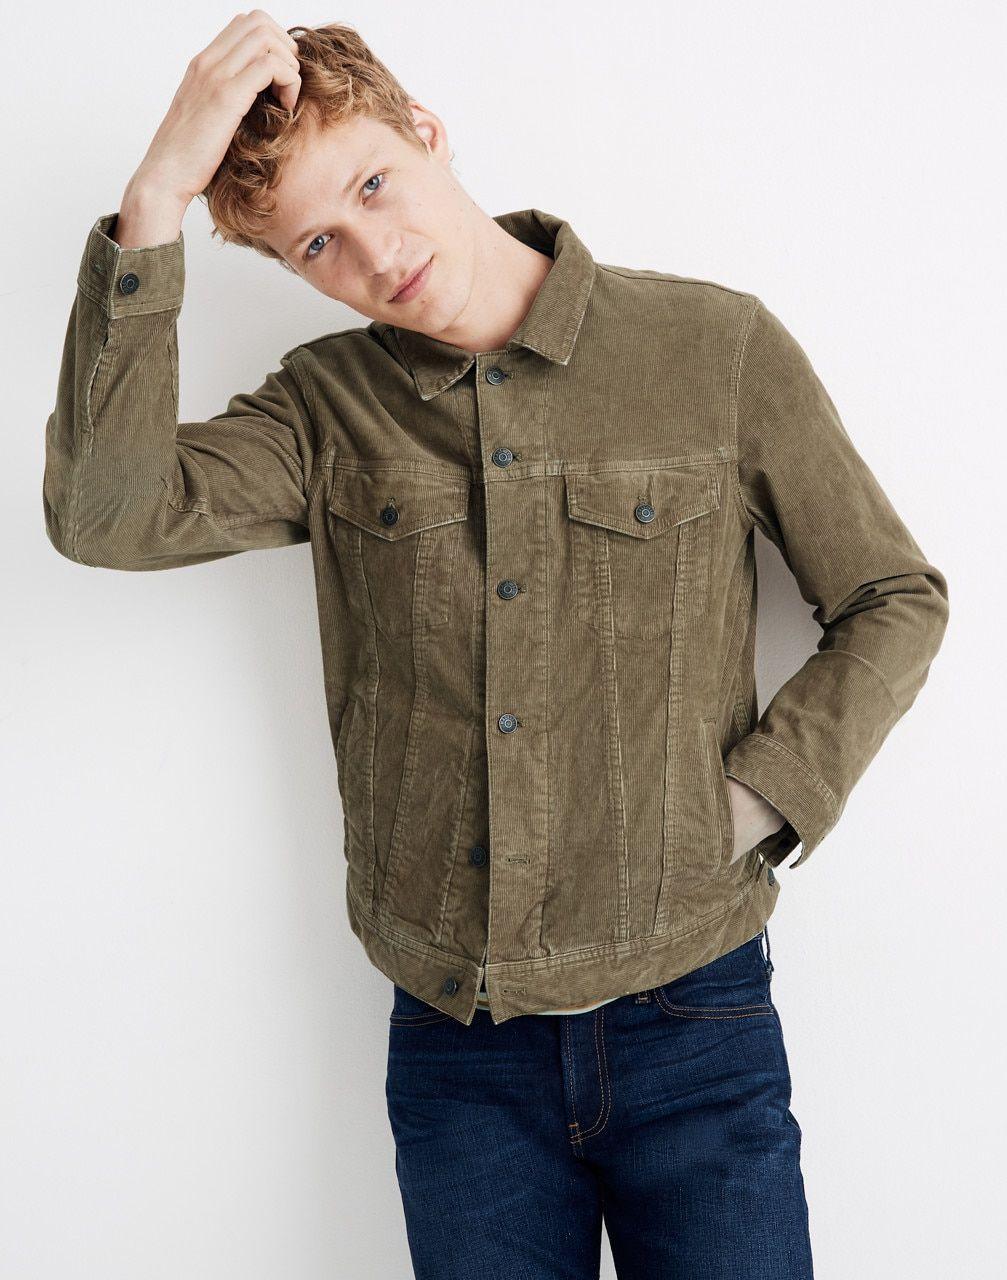 Classic Jean Jacket Corduroy Edition Denim Jacket Men Classic Jeans Denim Jacket And Jeans [ jpg ]